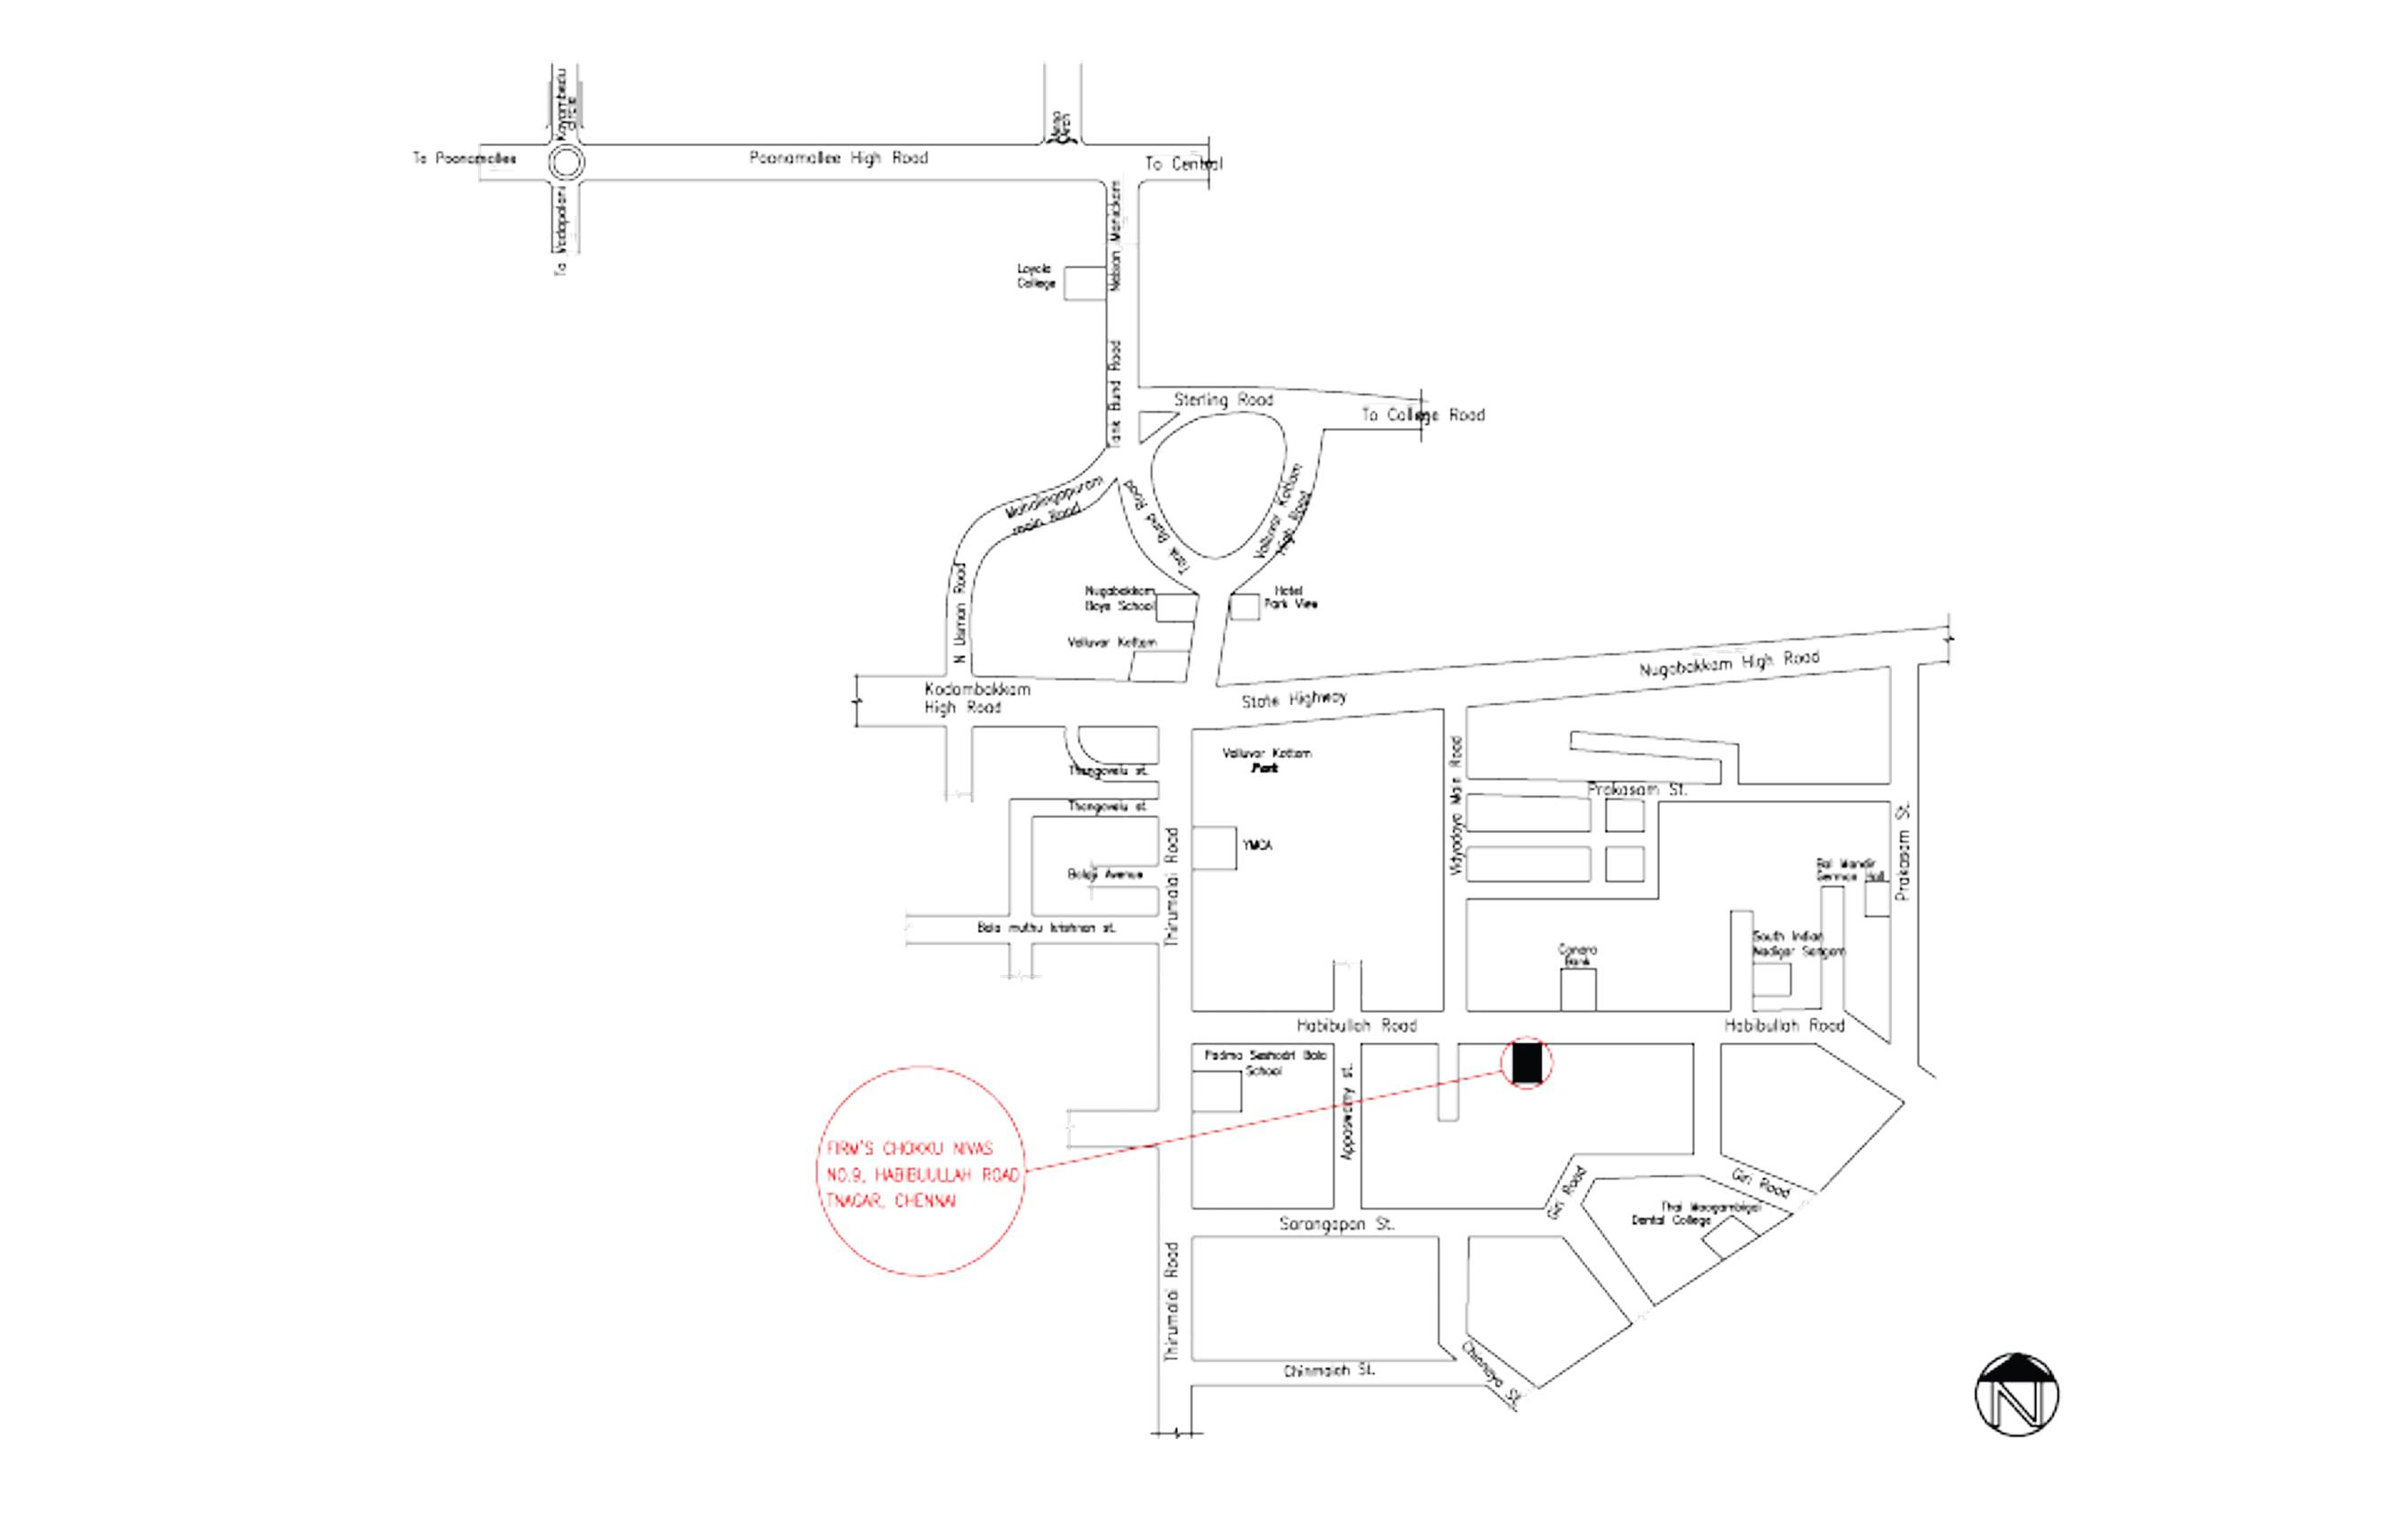 https://www.firmfoundations.in/projects/location/thumbnails/13712353497locationmap.jpg